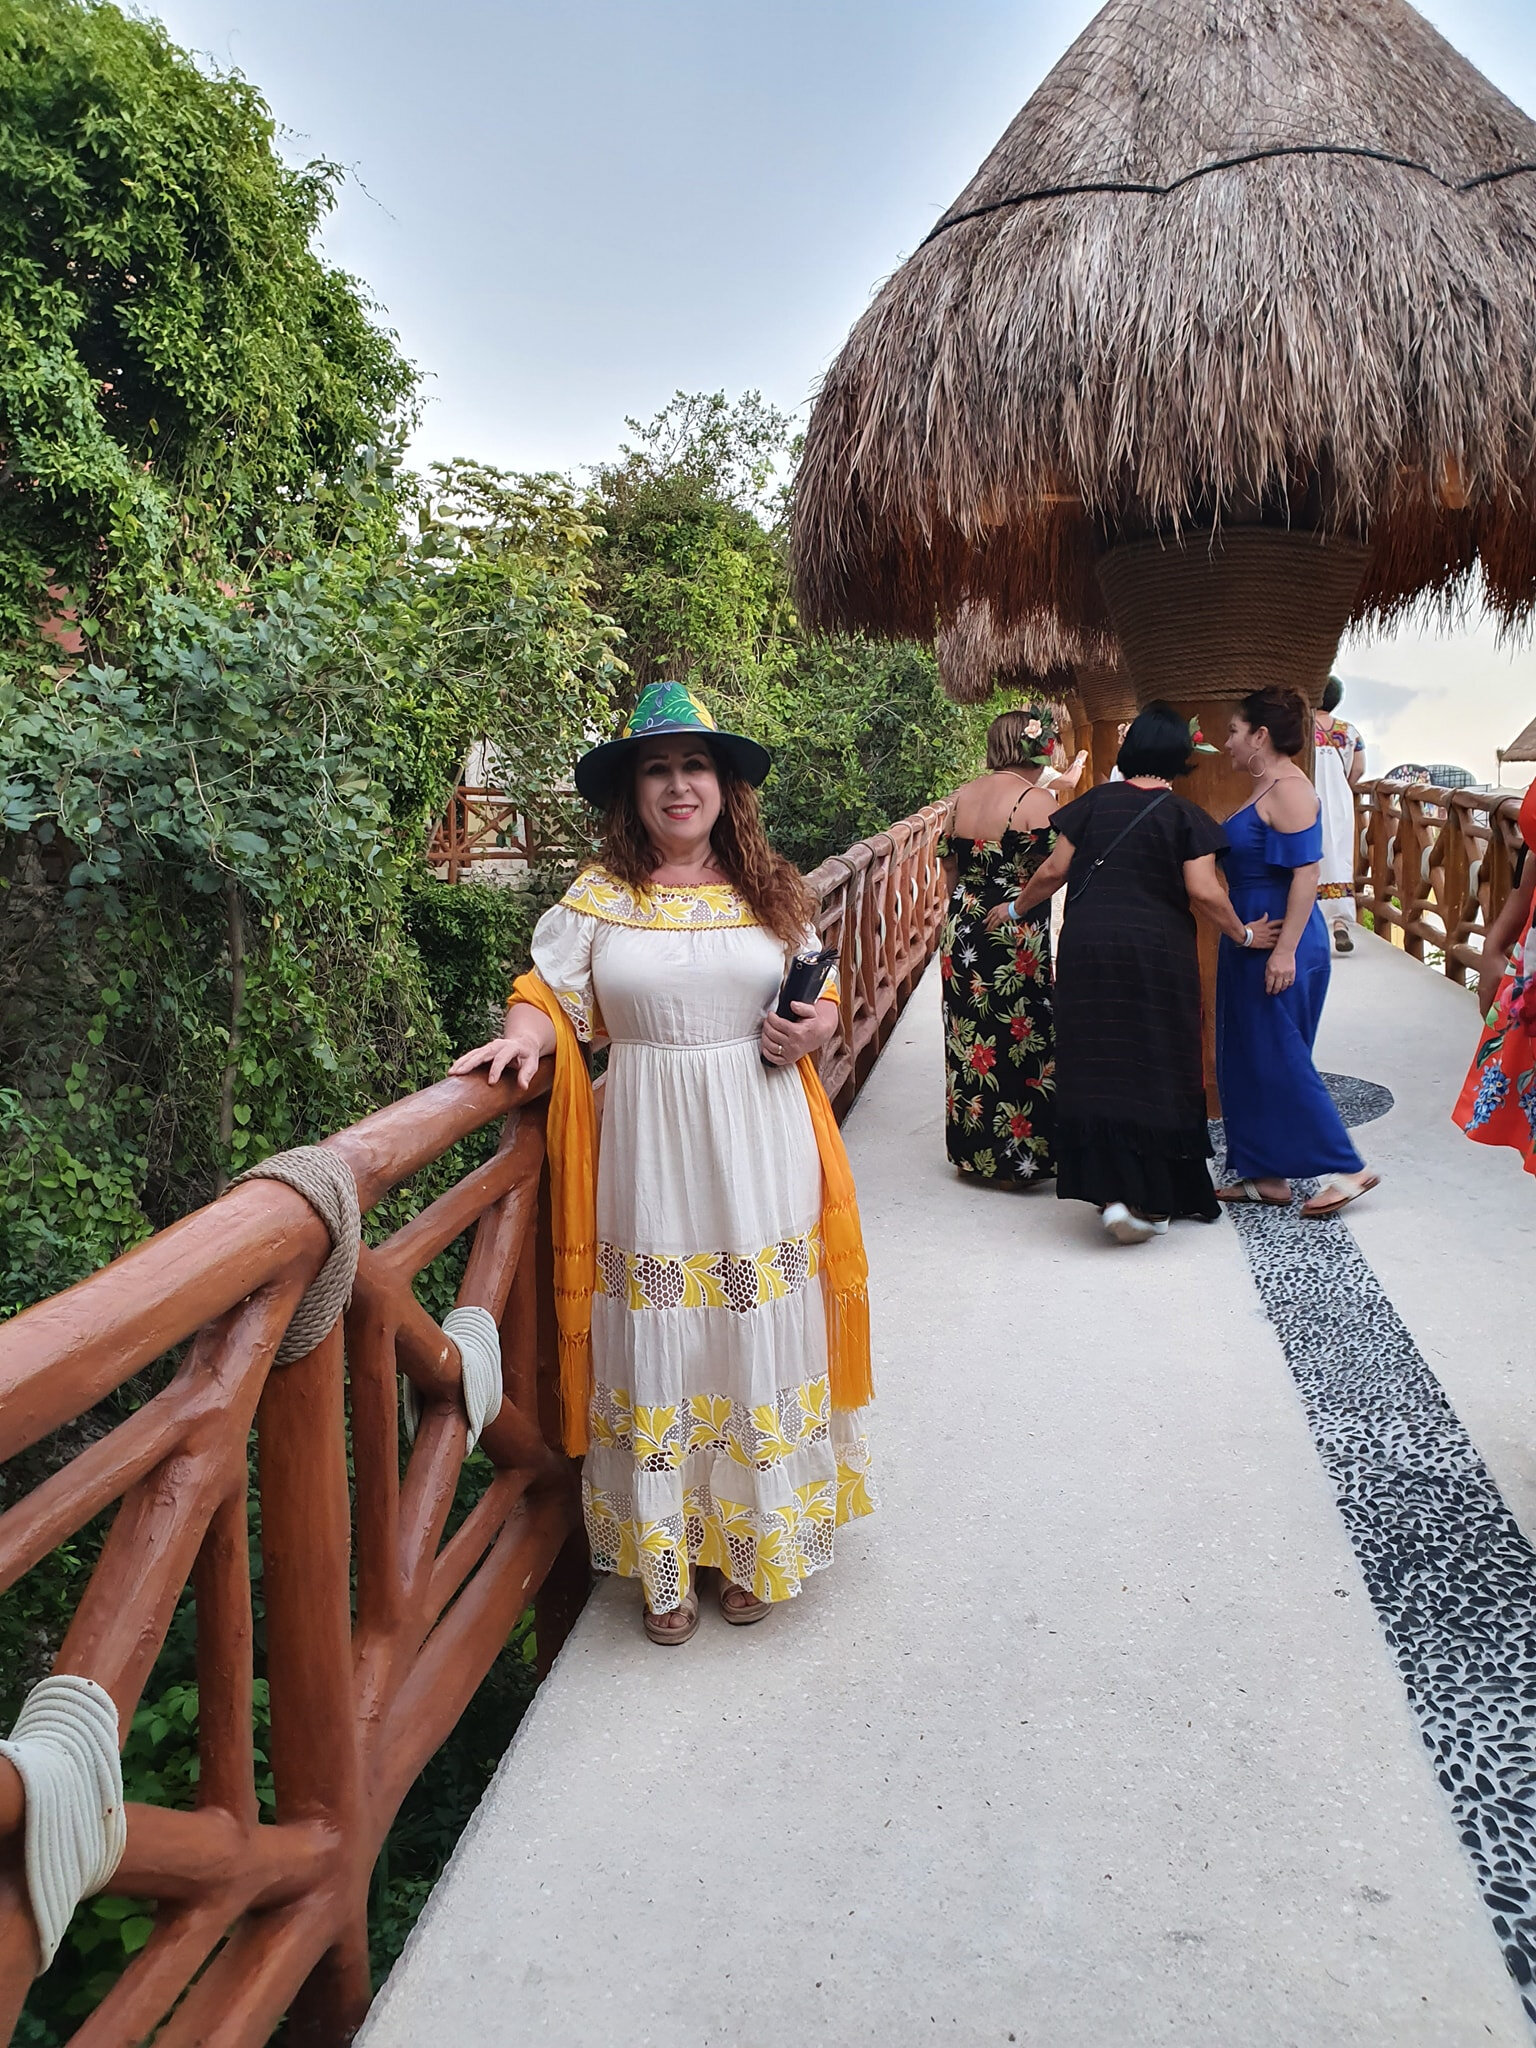 TÉMOIGNAGE DE ALICIA SANCHEZ